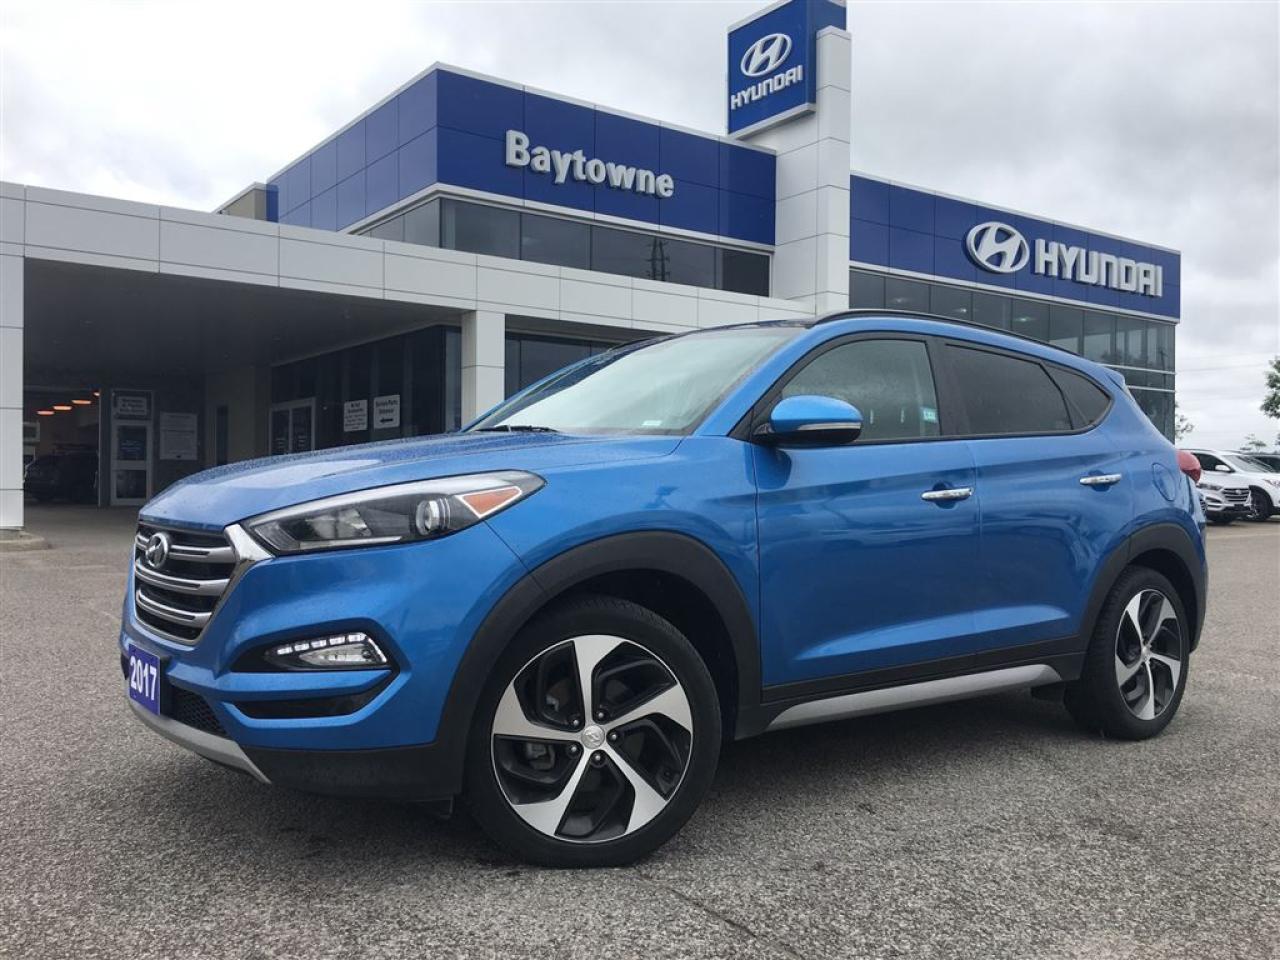 2017 Hyundai Tucson AWD 1.6T SE Previous Daily Rental